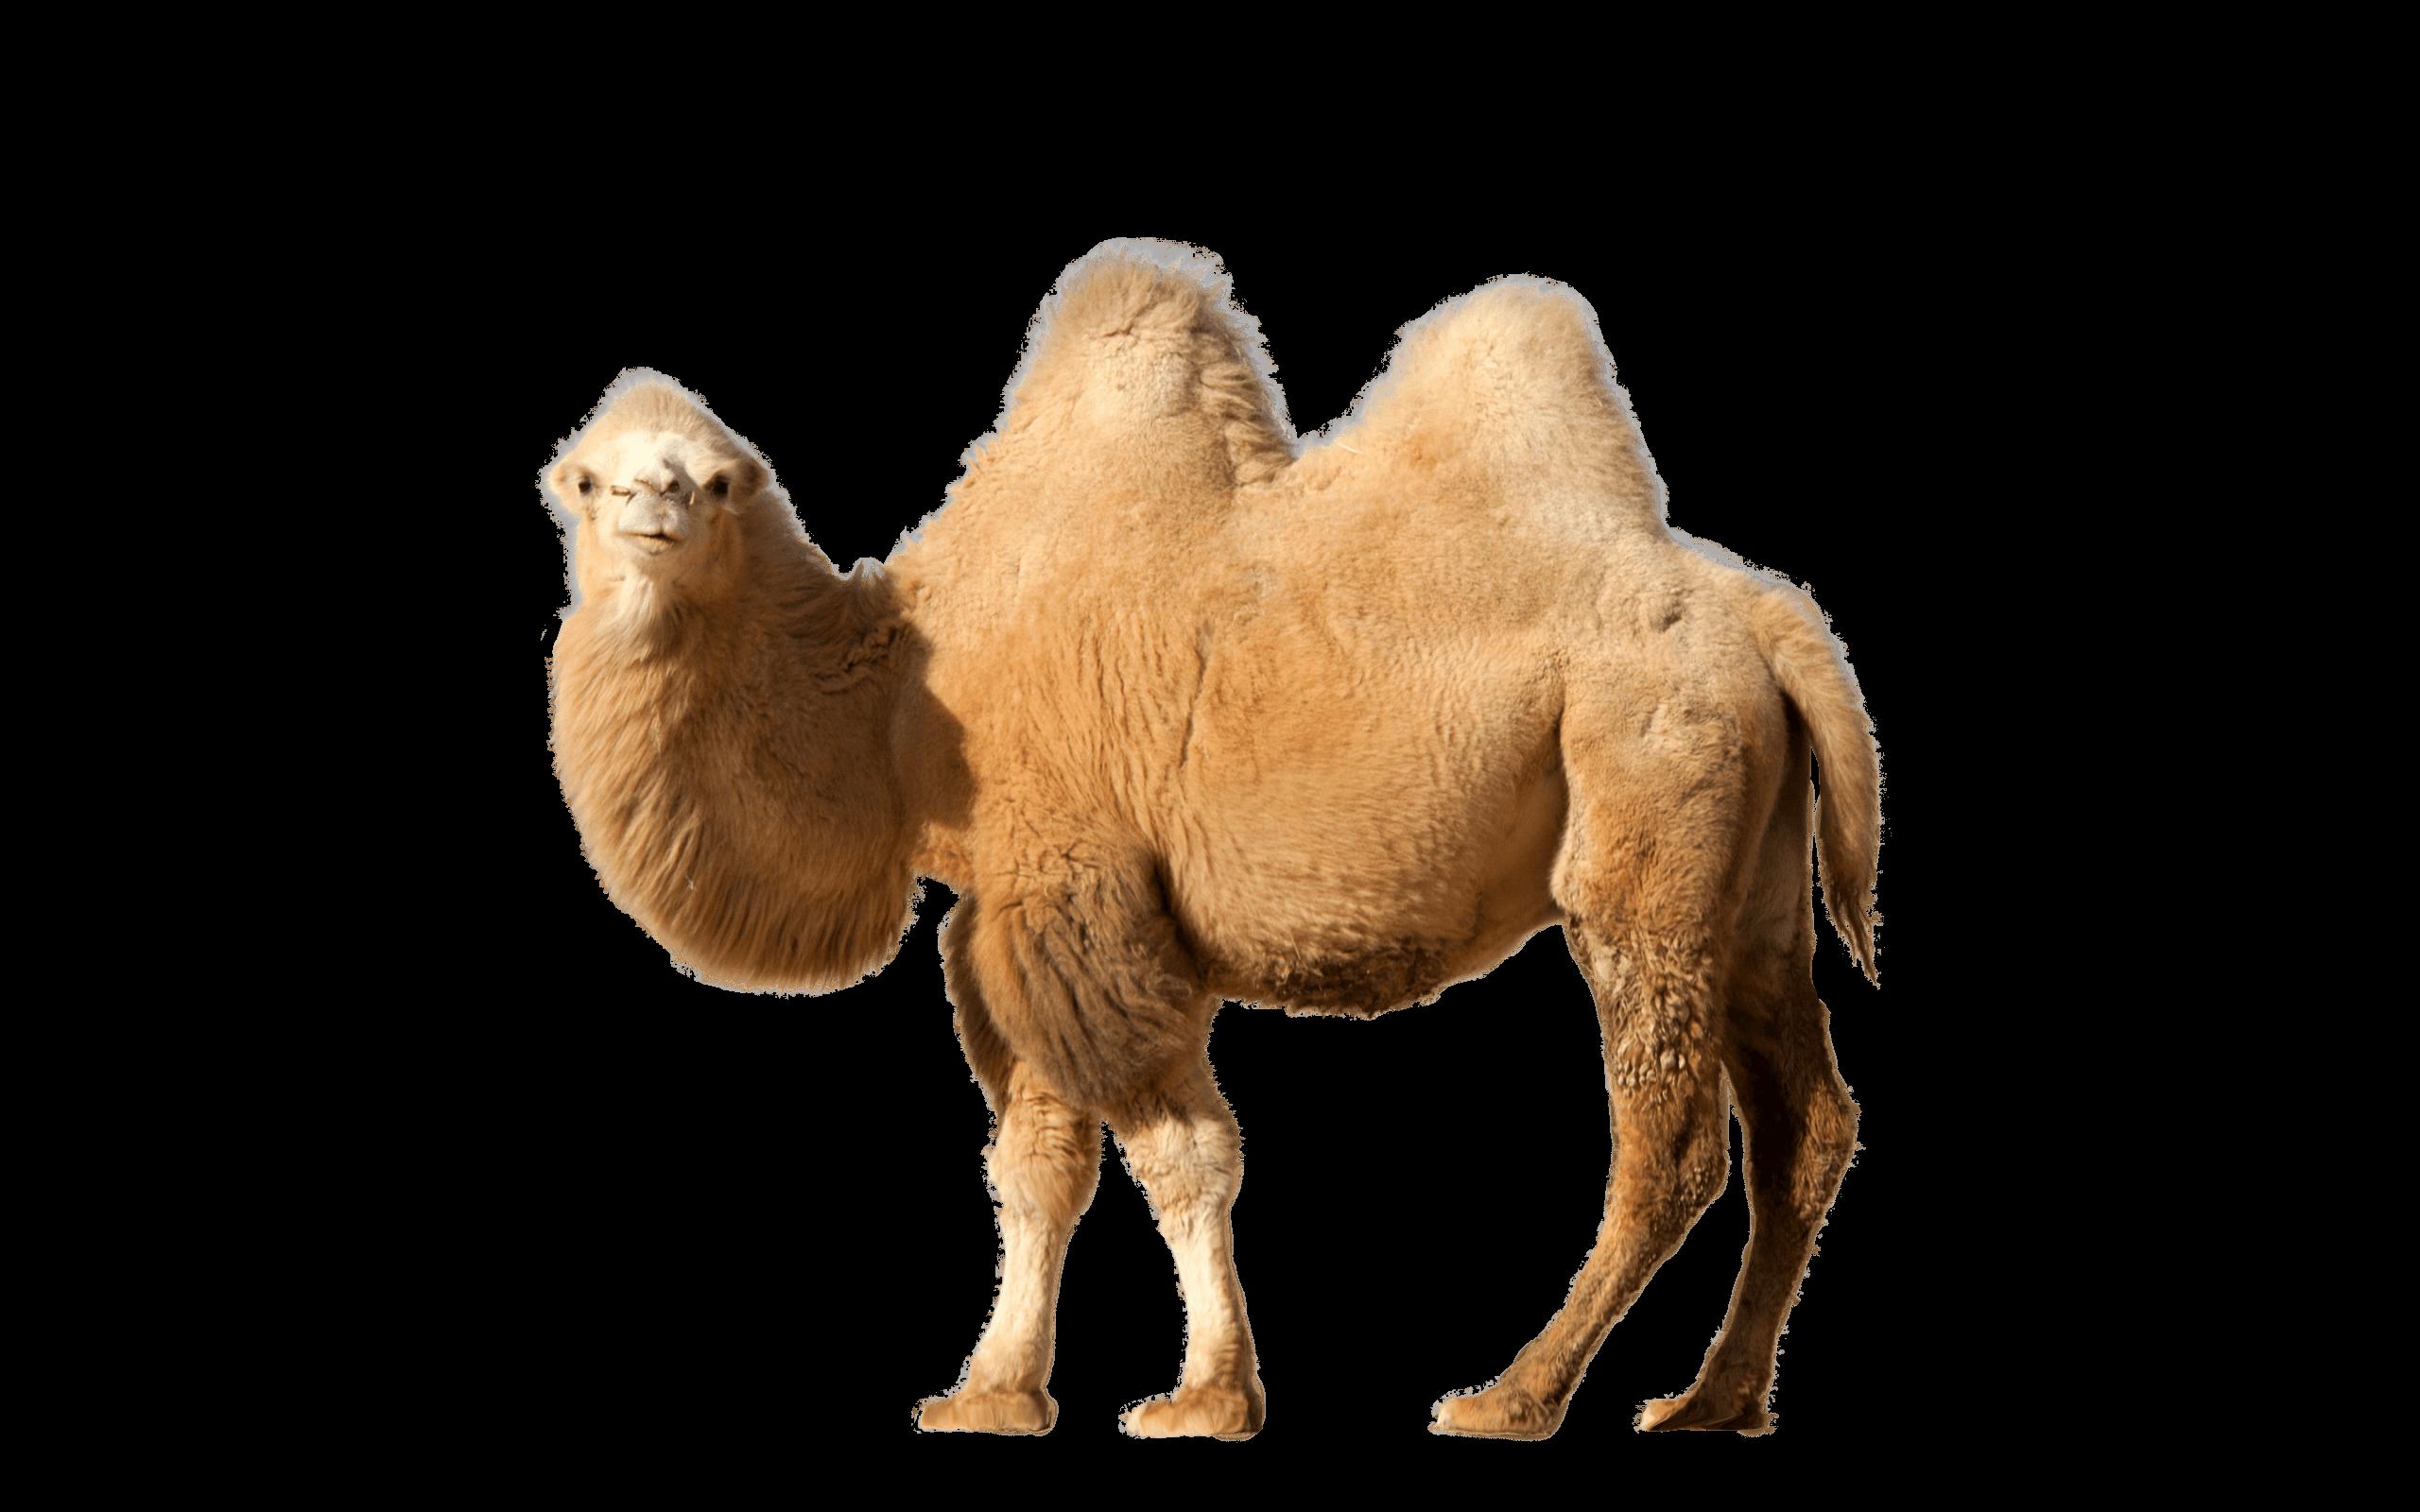 Camel Single - Desert Camel PNG